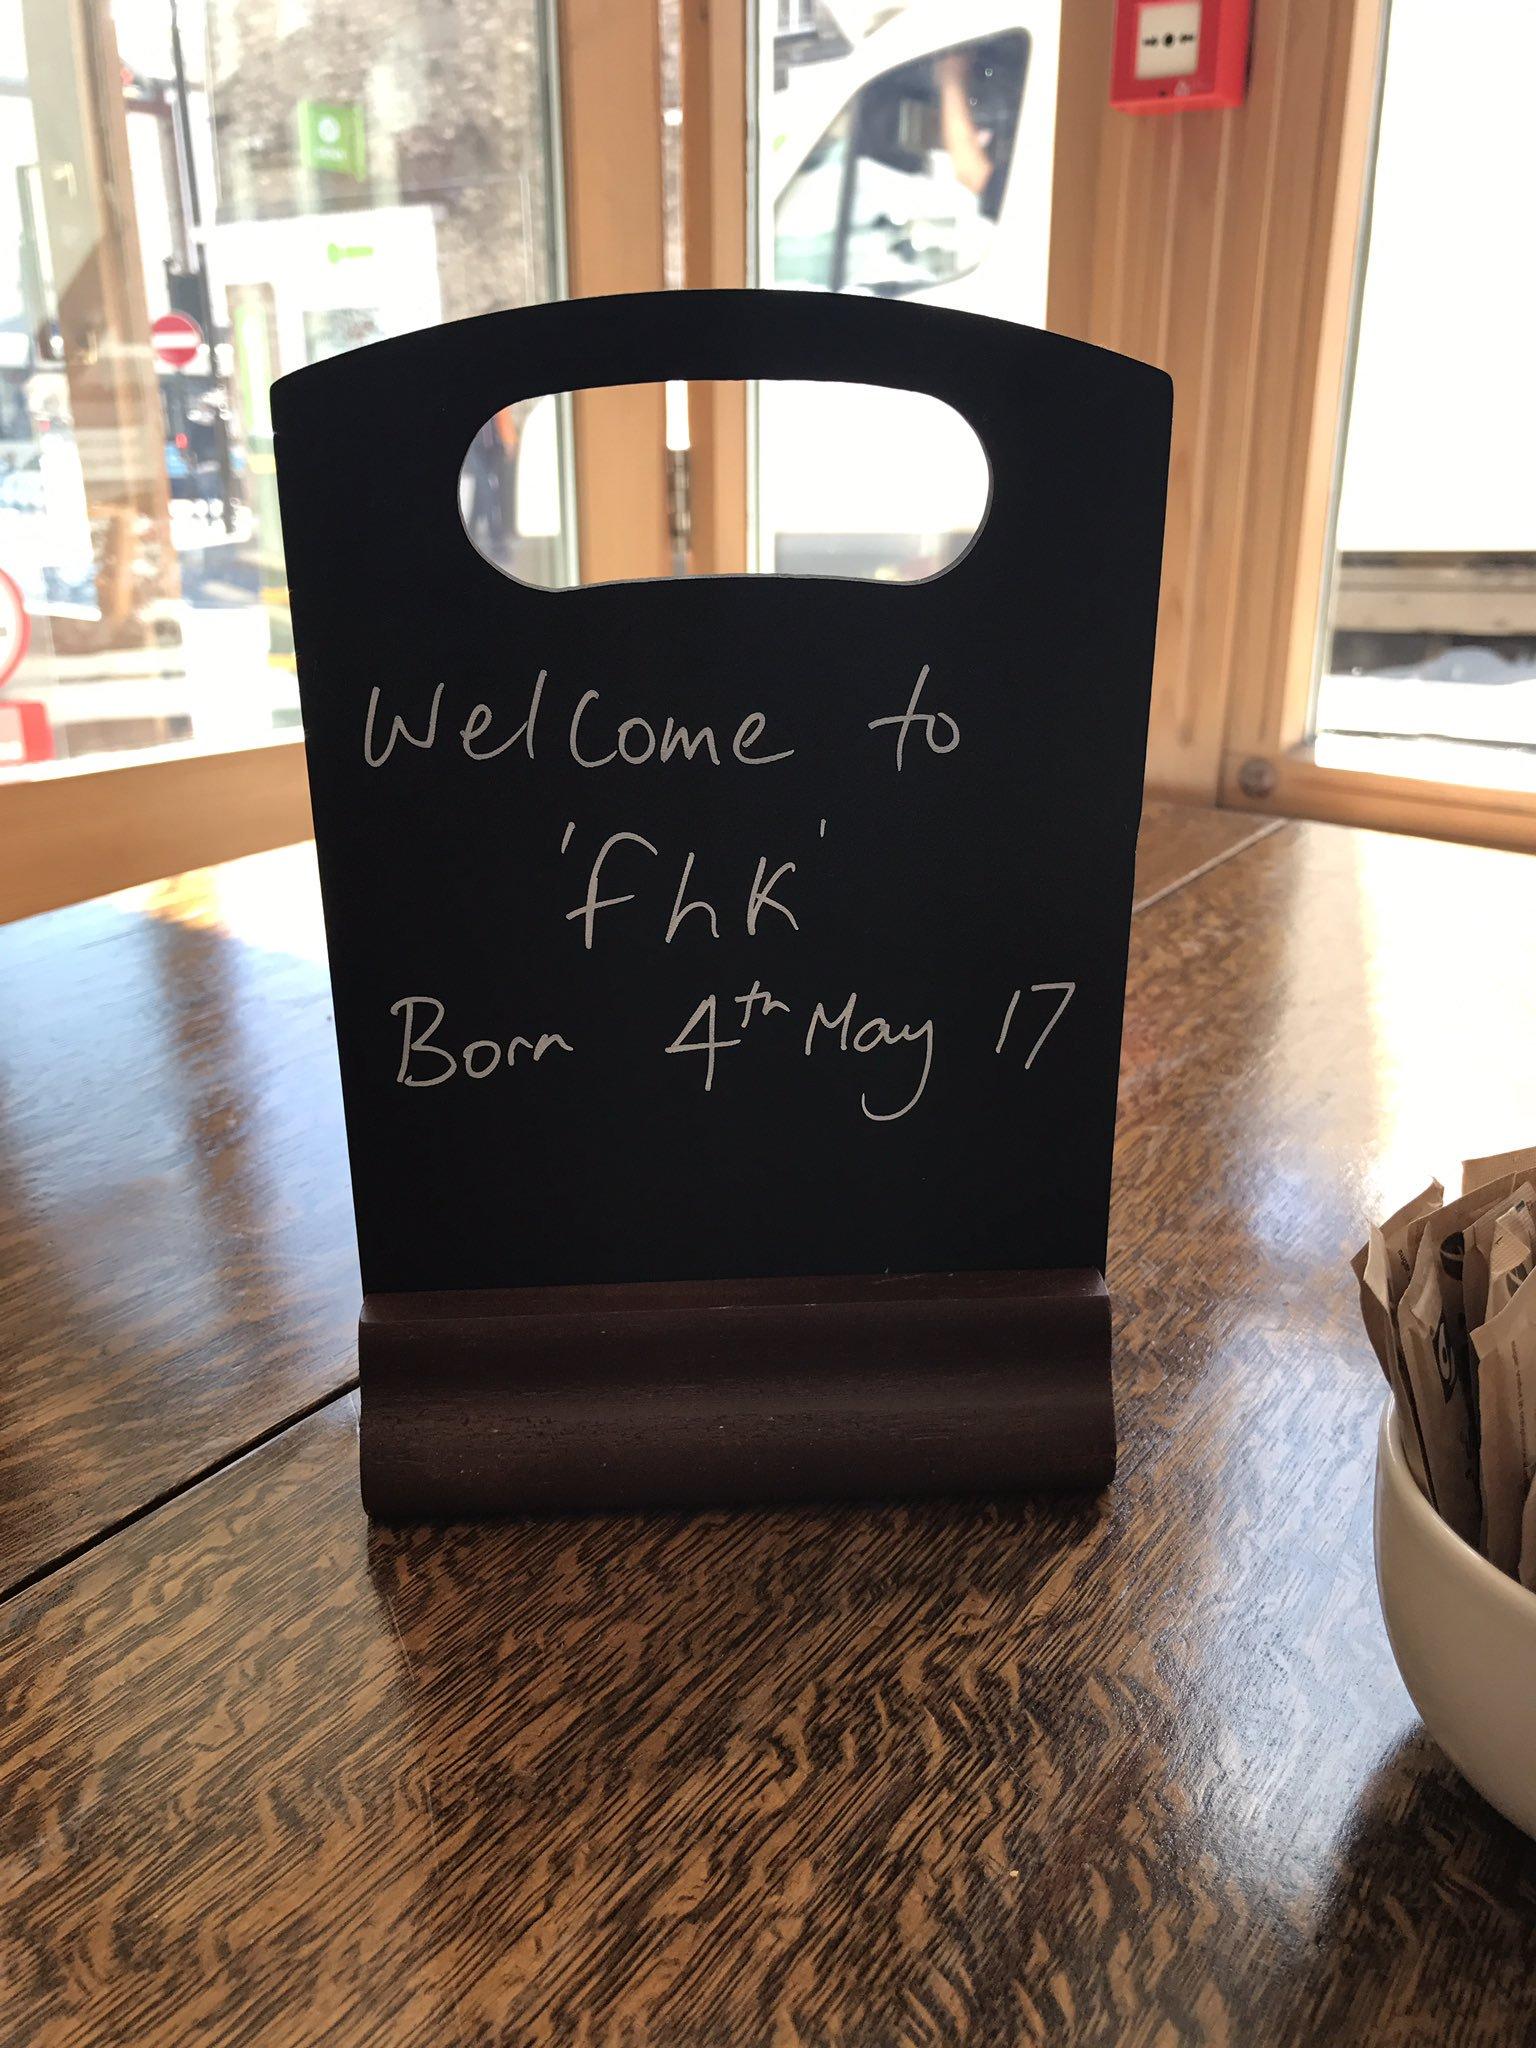 4th May birth of fhk